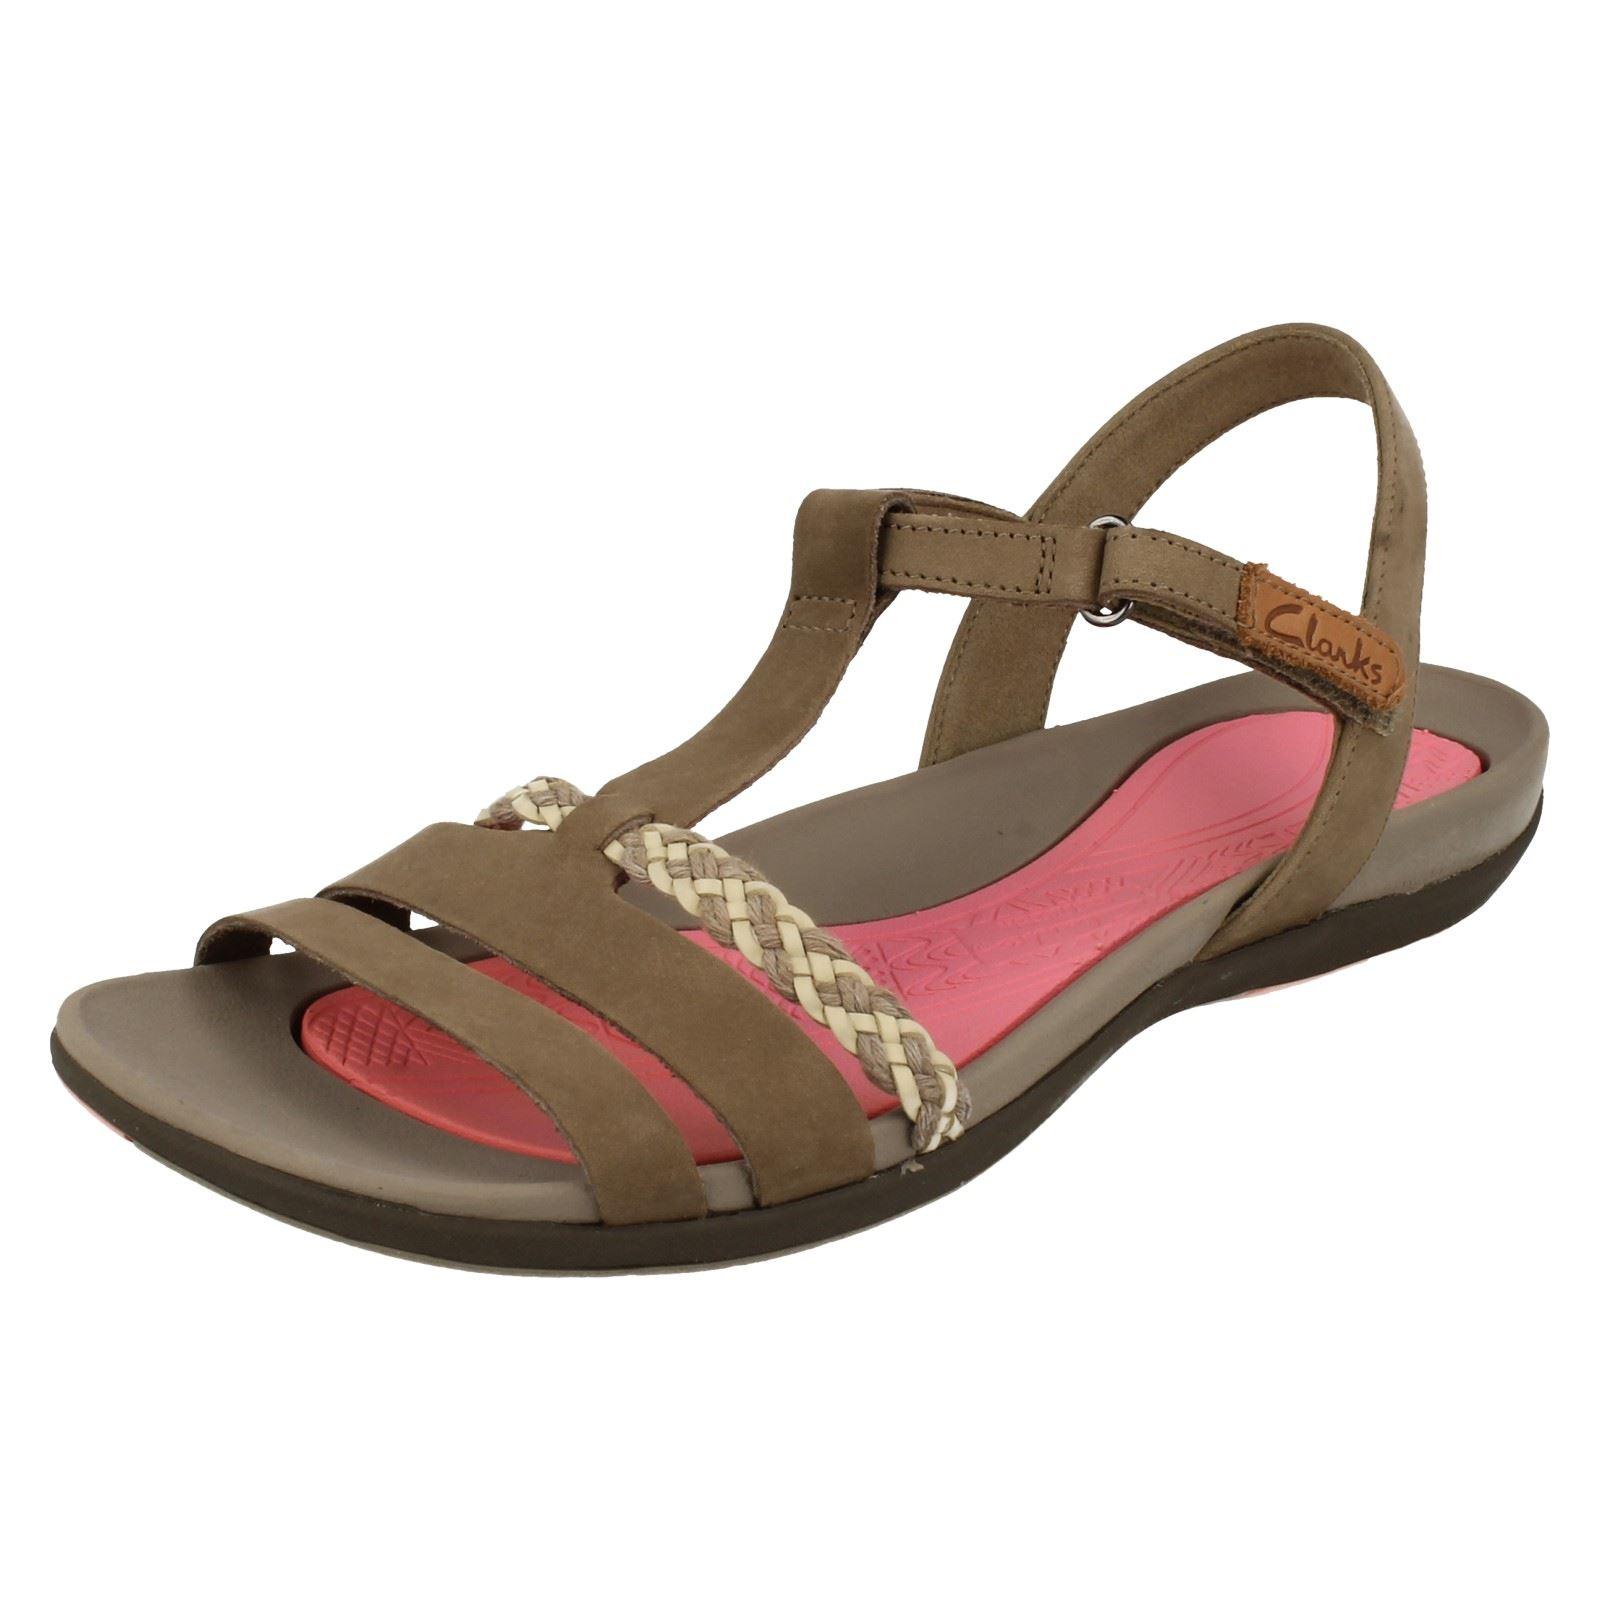 Ladies Clarks Casual Summer Sandals Tealite Grace Ebay